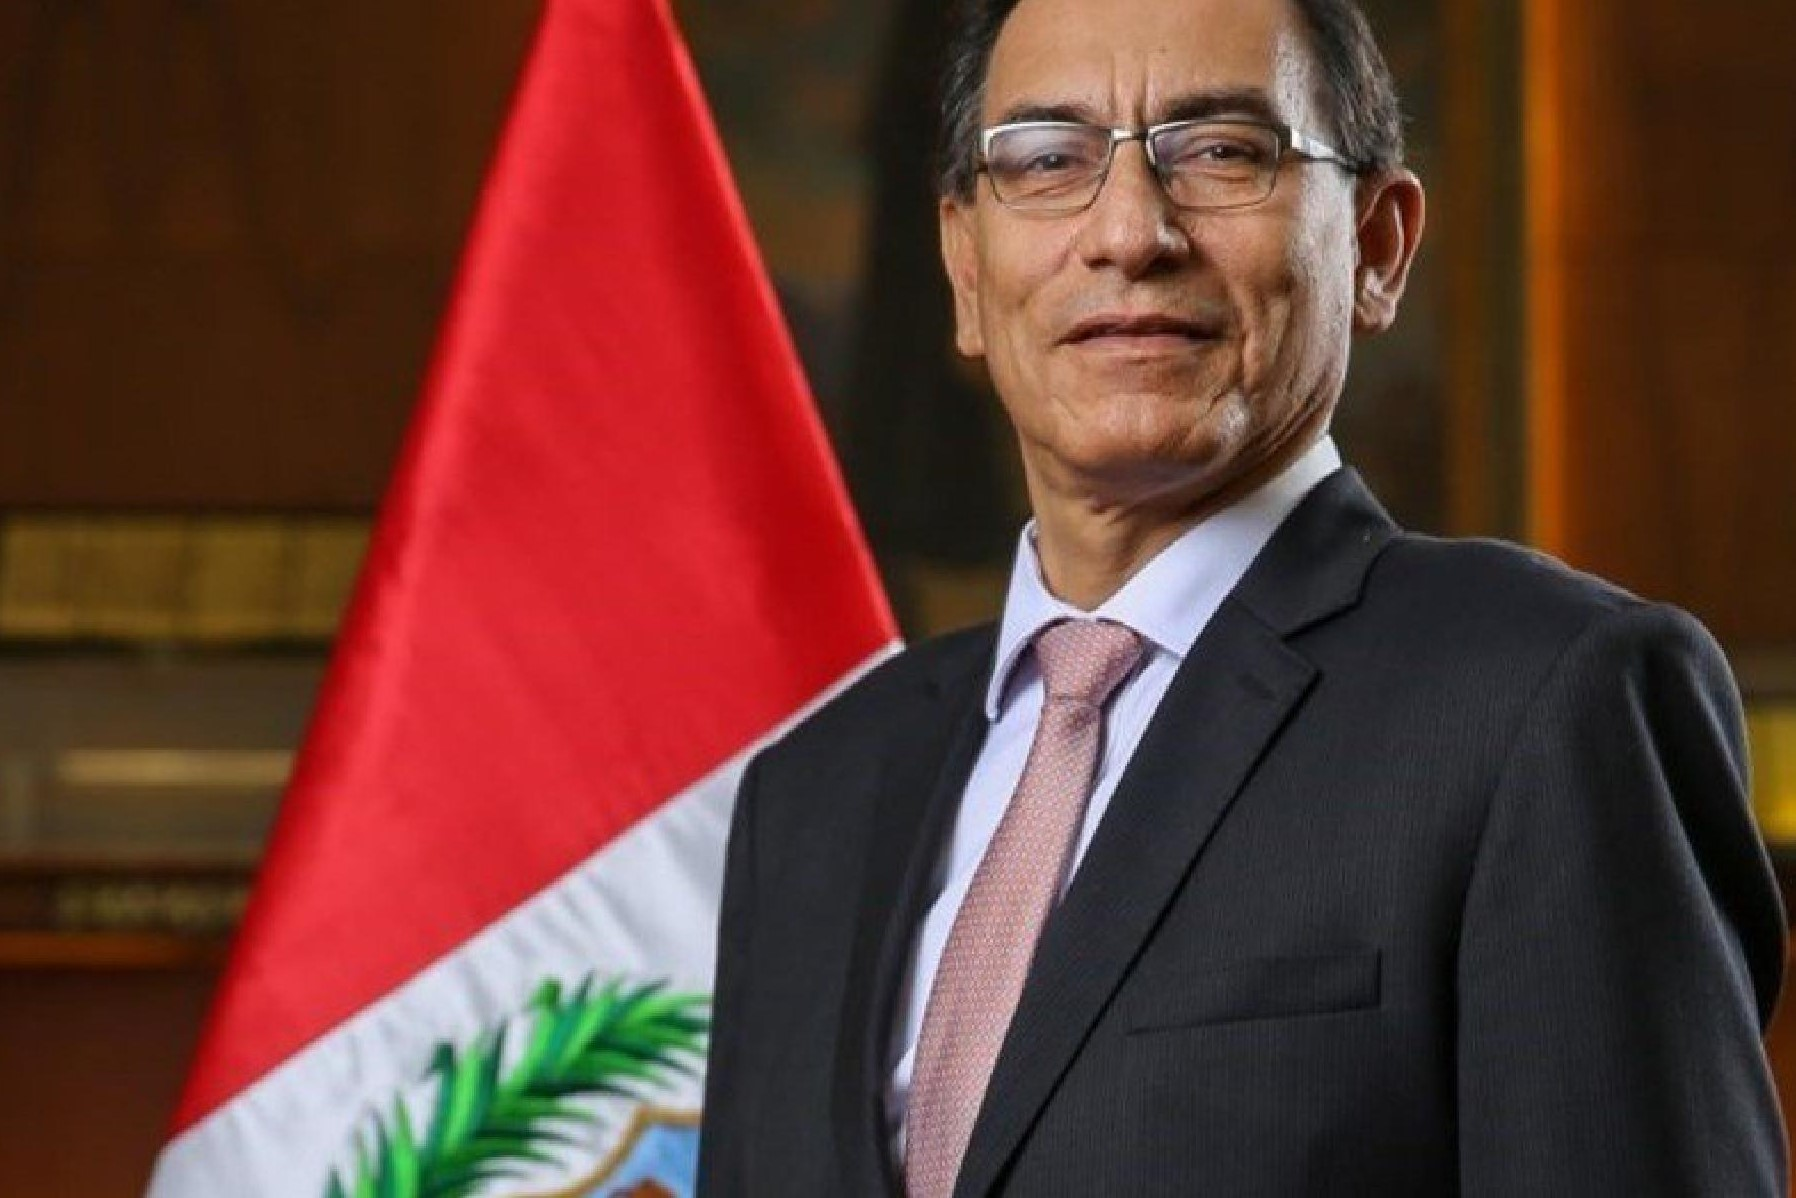 Will Peru's President dissolve Congress?